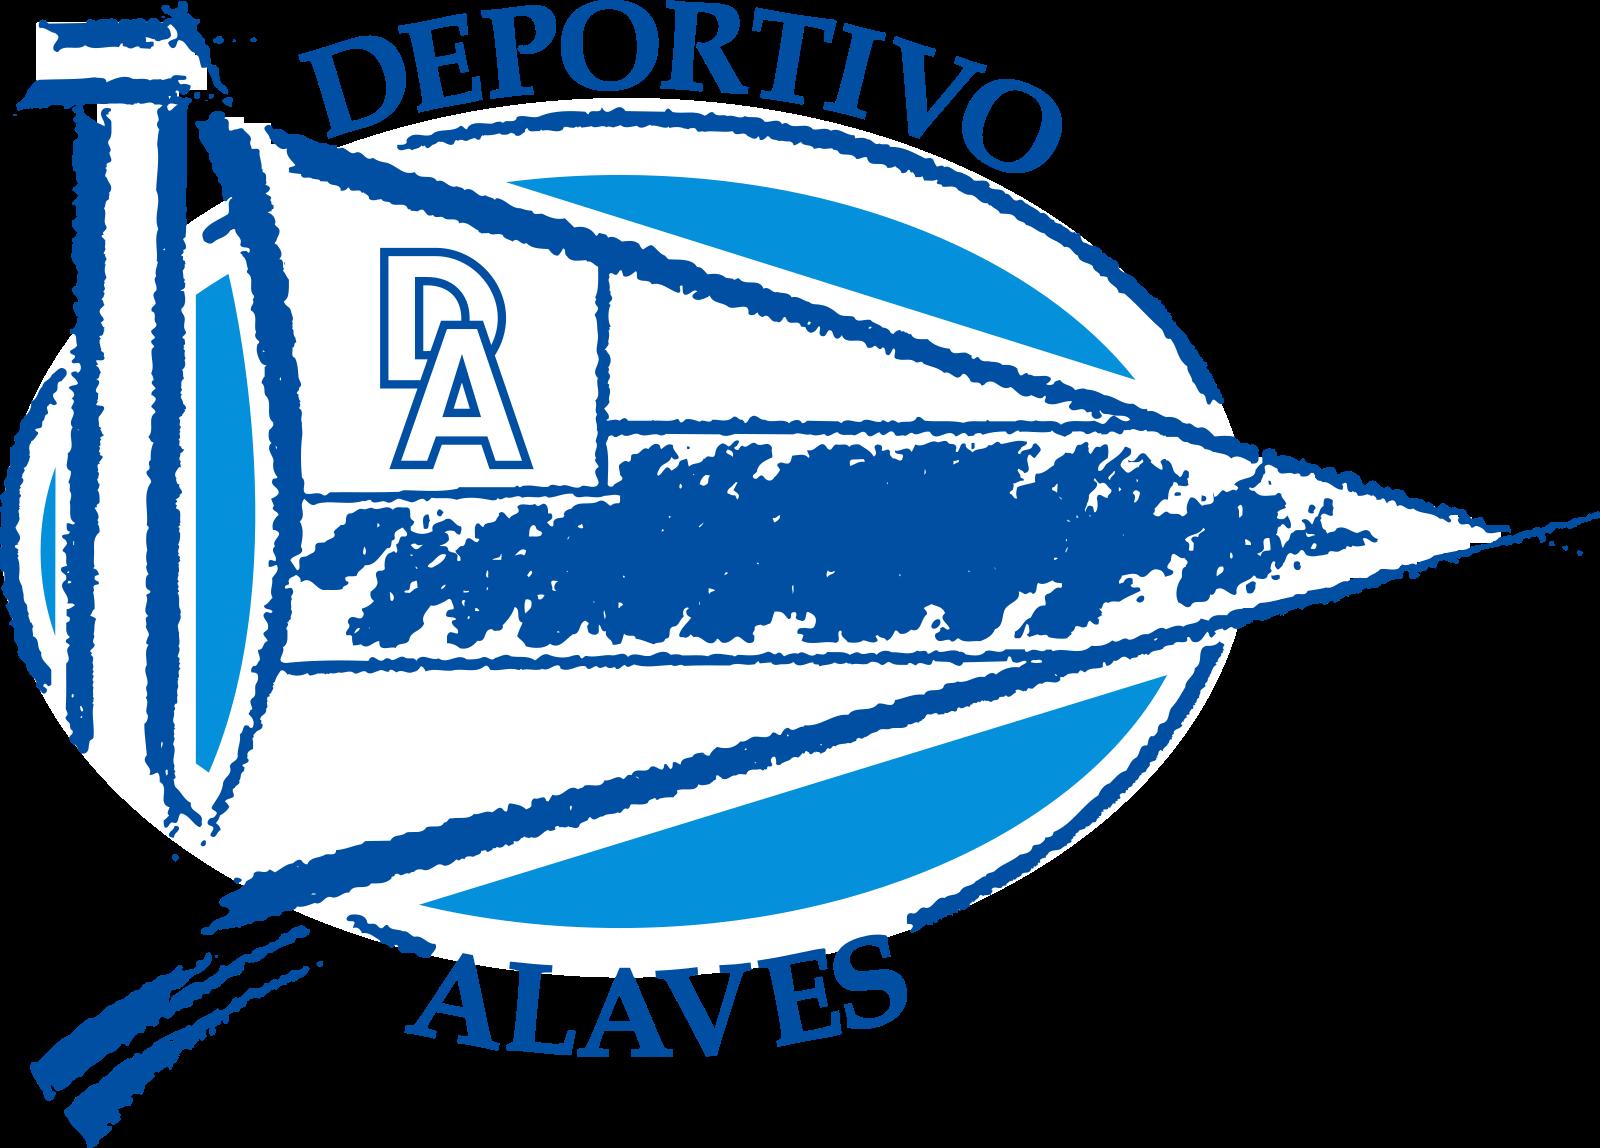 deportivo Alaves logo 2 - Deportivo Alavés Logo